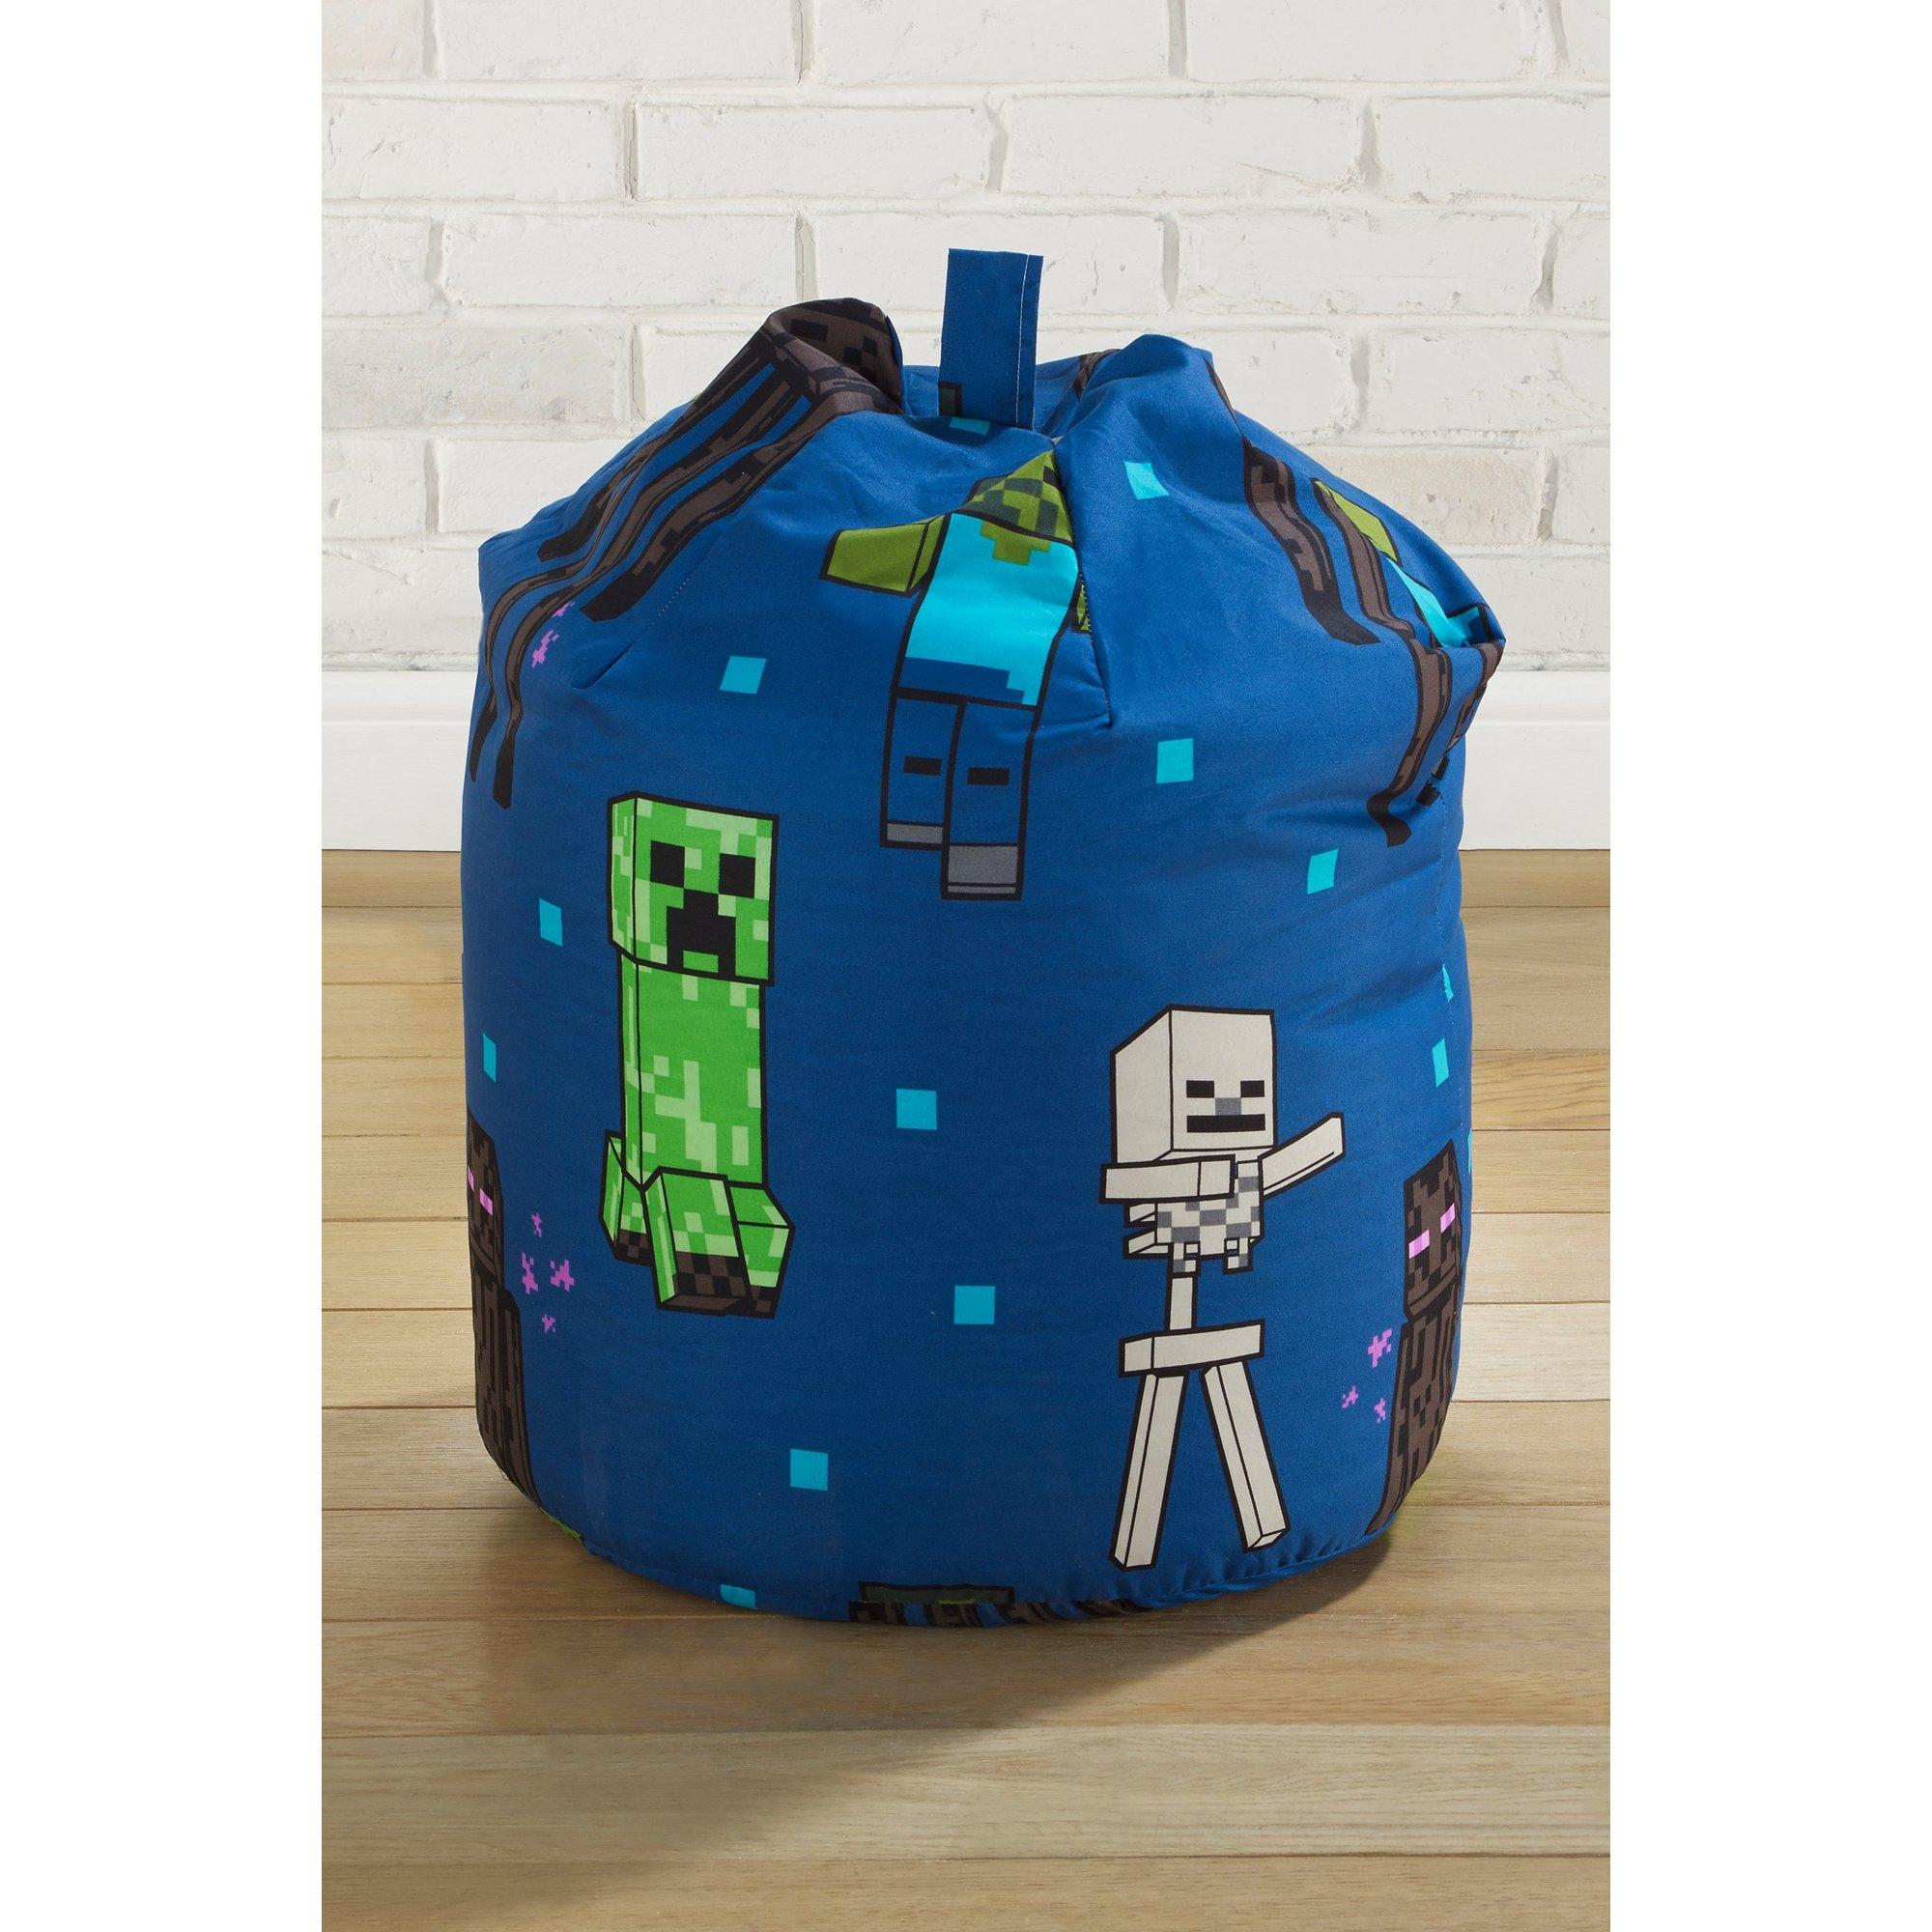 Image of Minecraft Creeps Beanbag